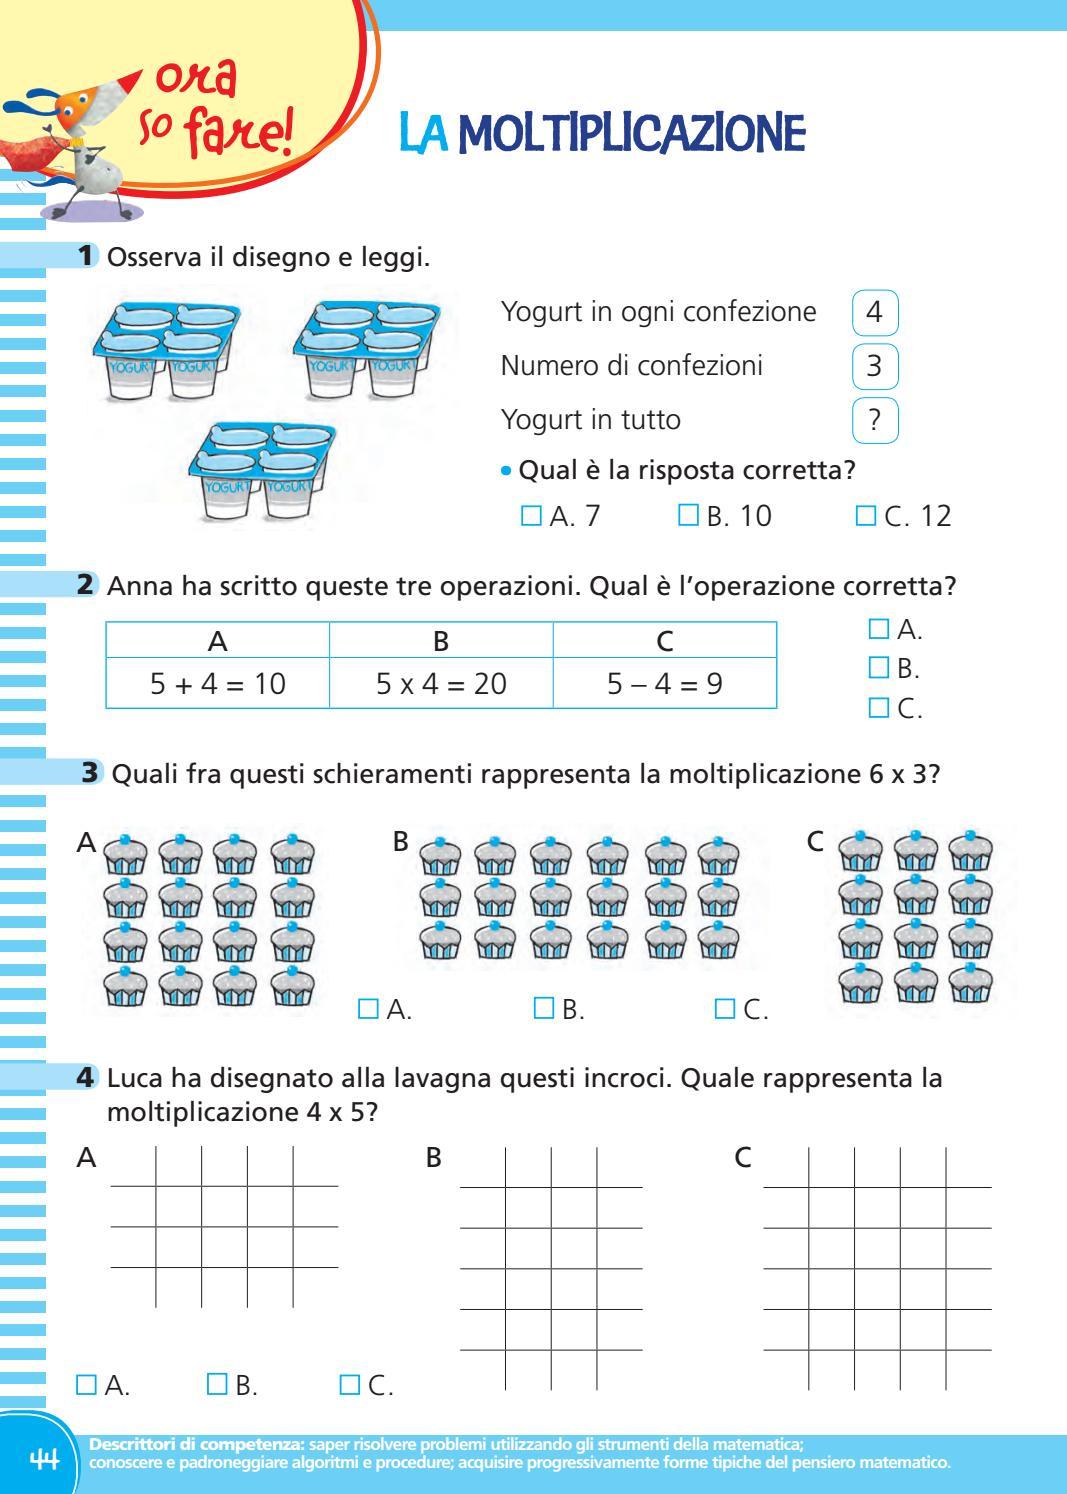 Il mio super quaderno matematica 2 by Amelie - Issuu